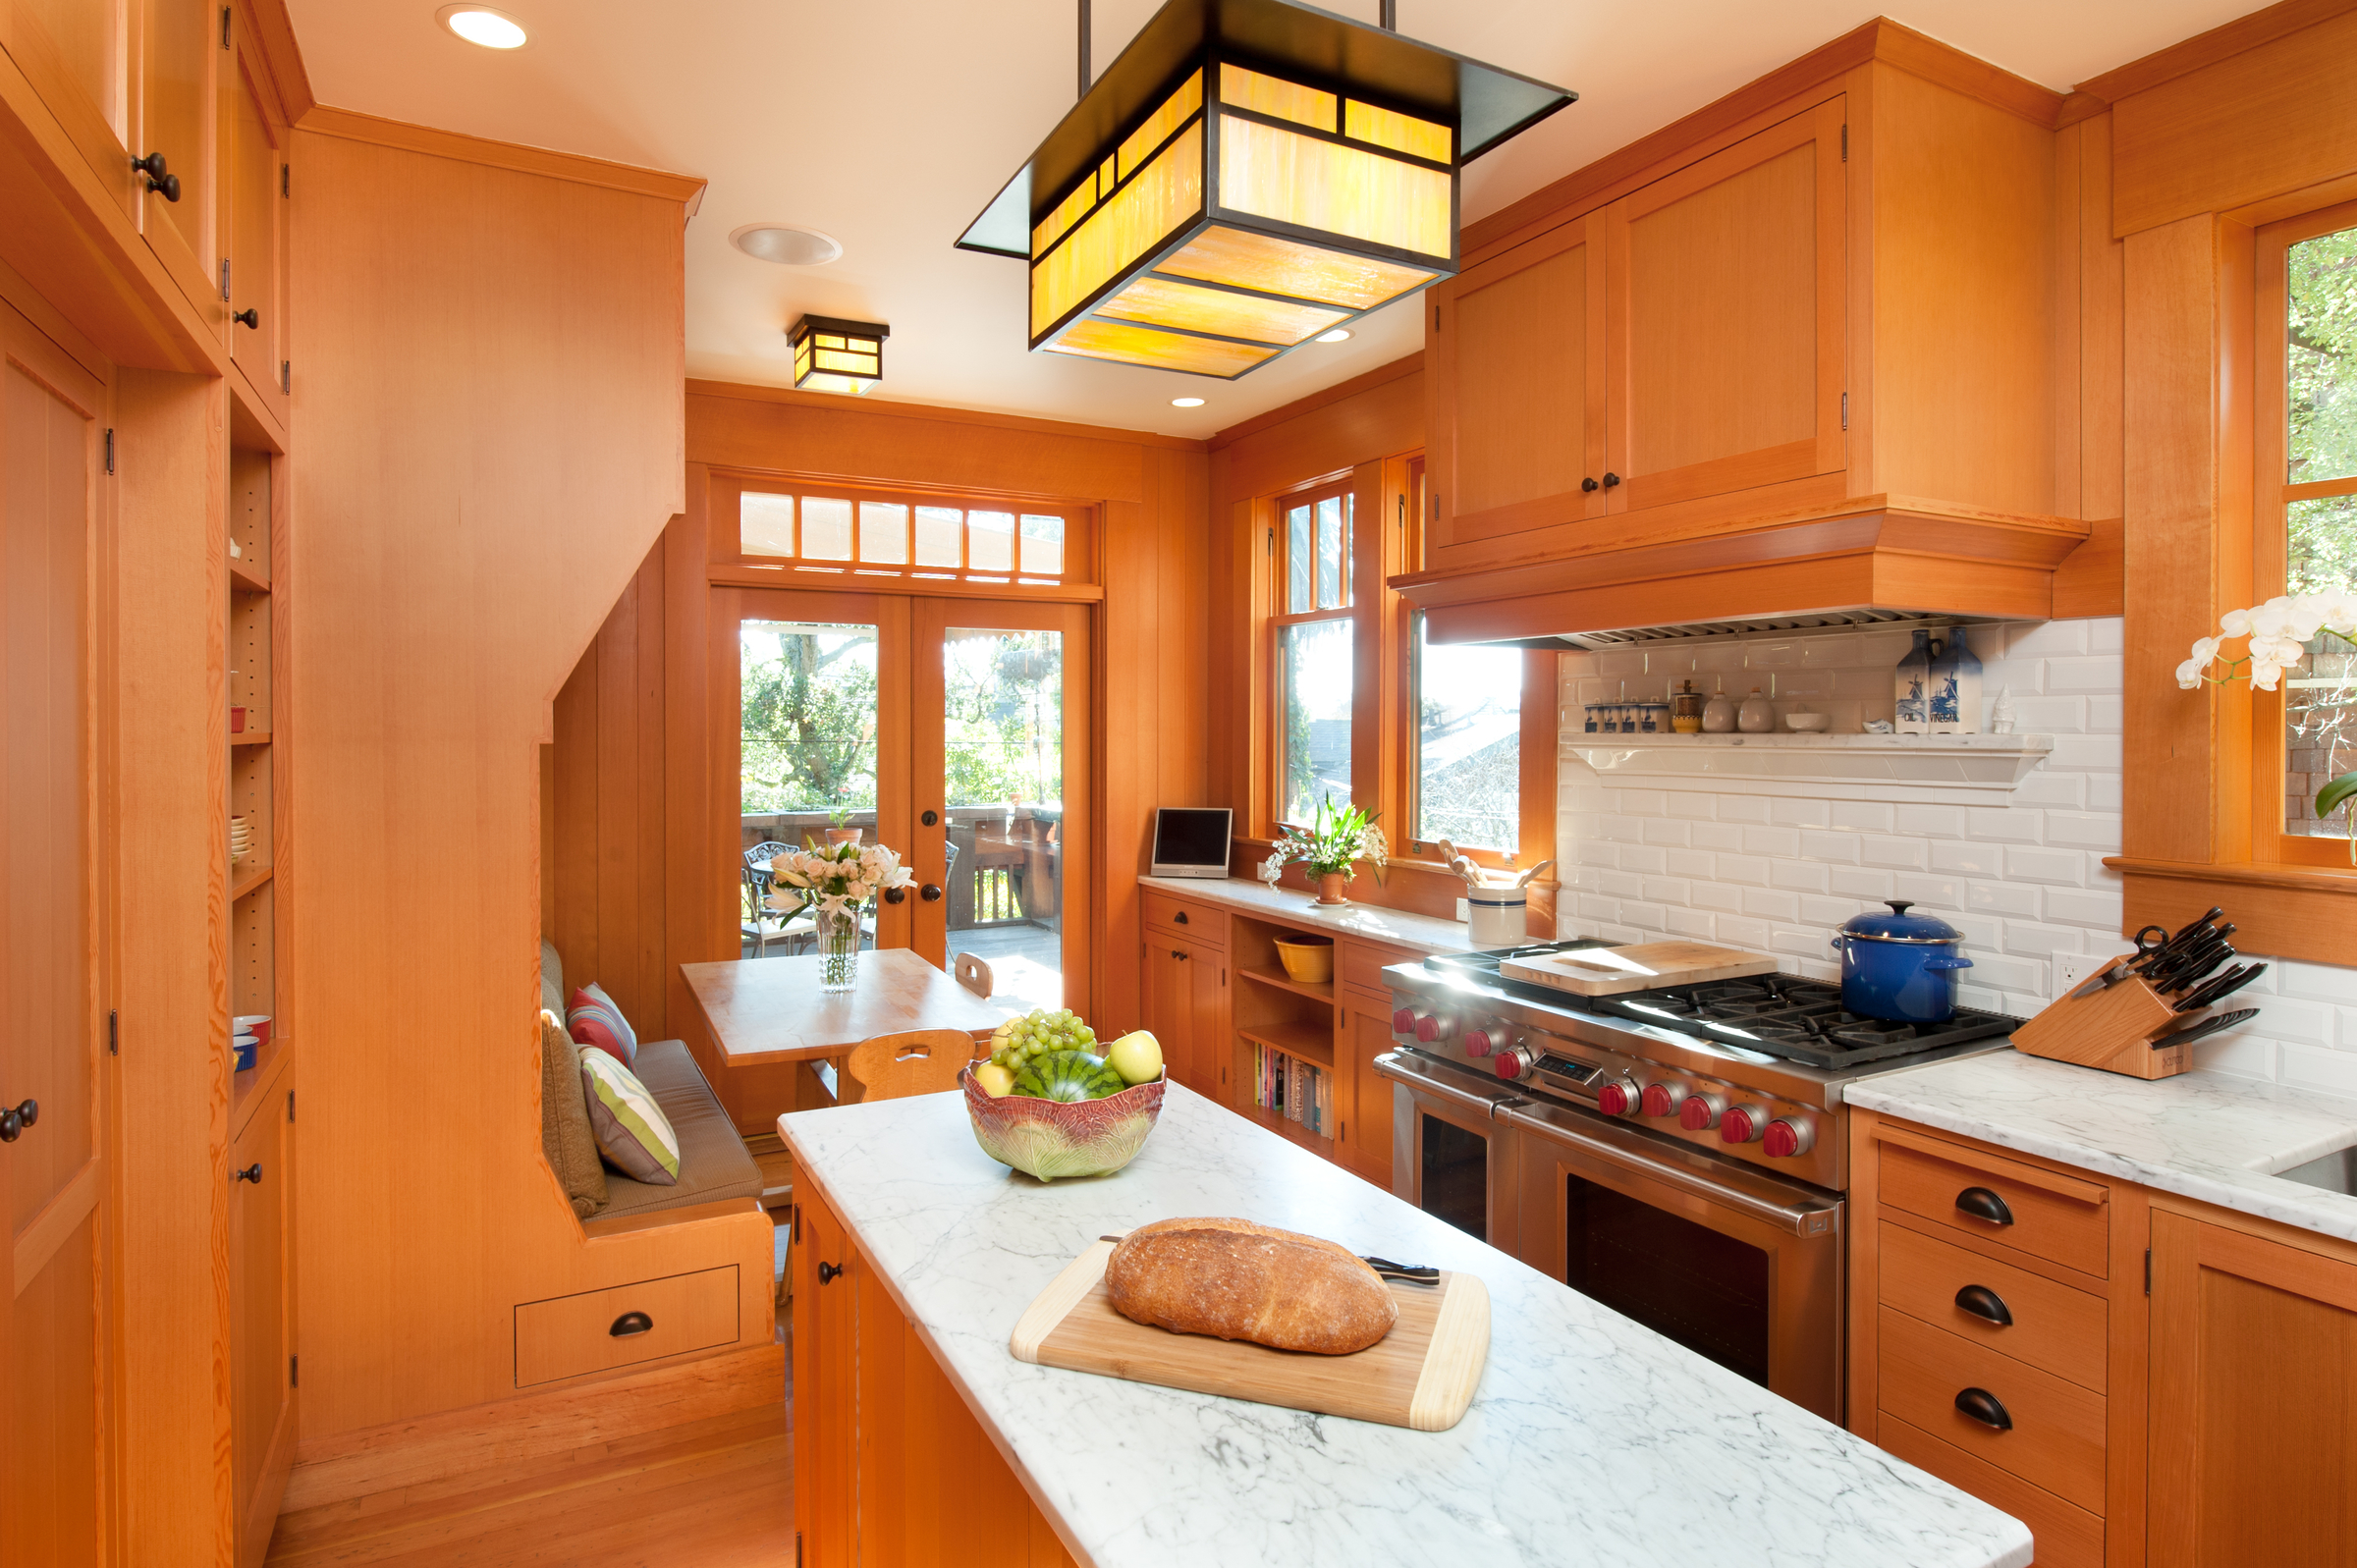 Kitchen_IslandView_horizontal.jpg